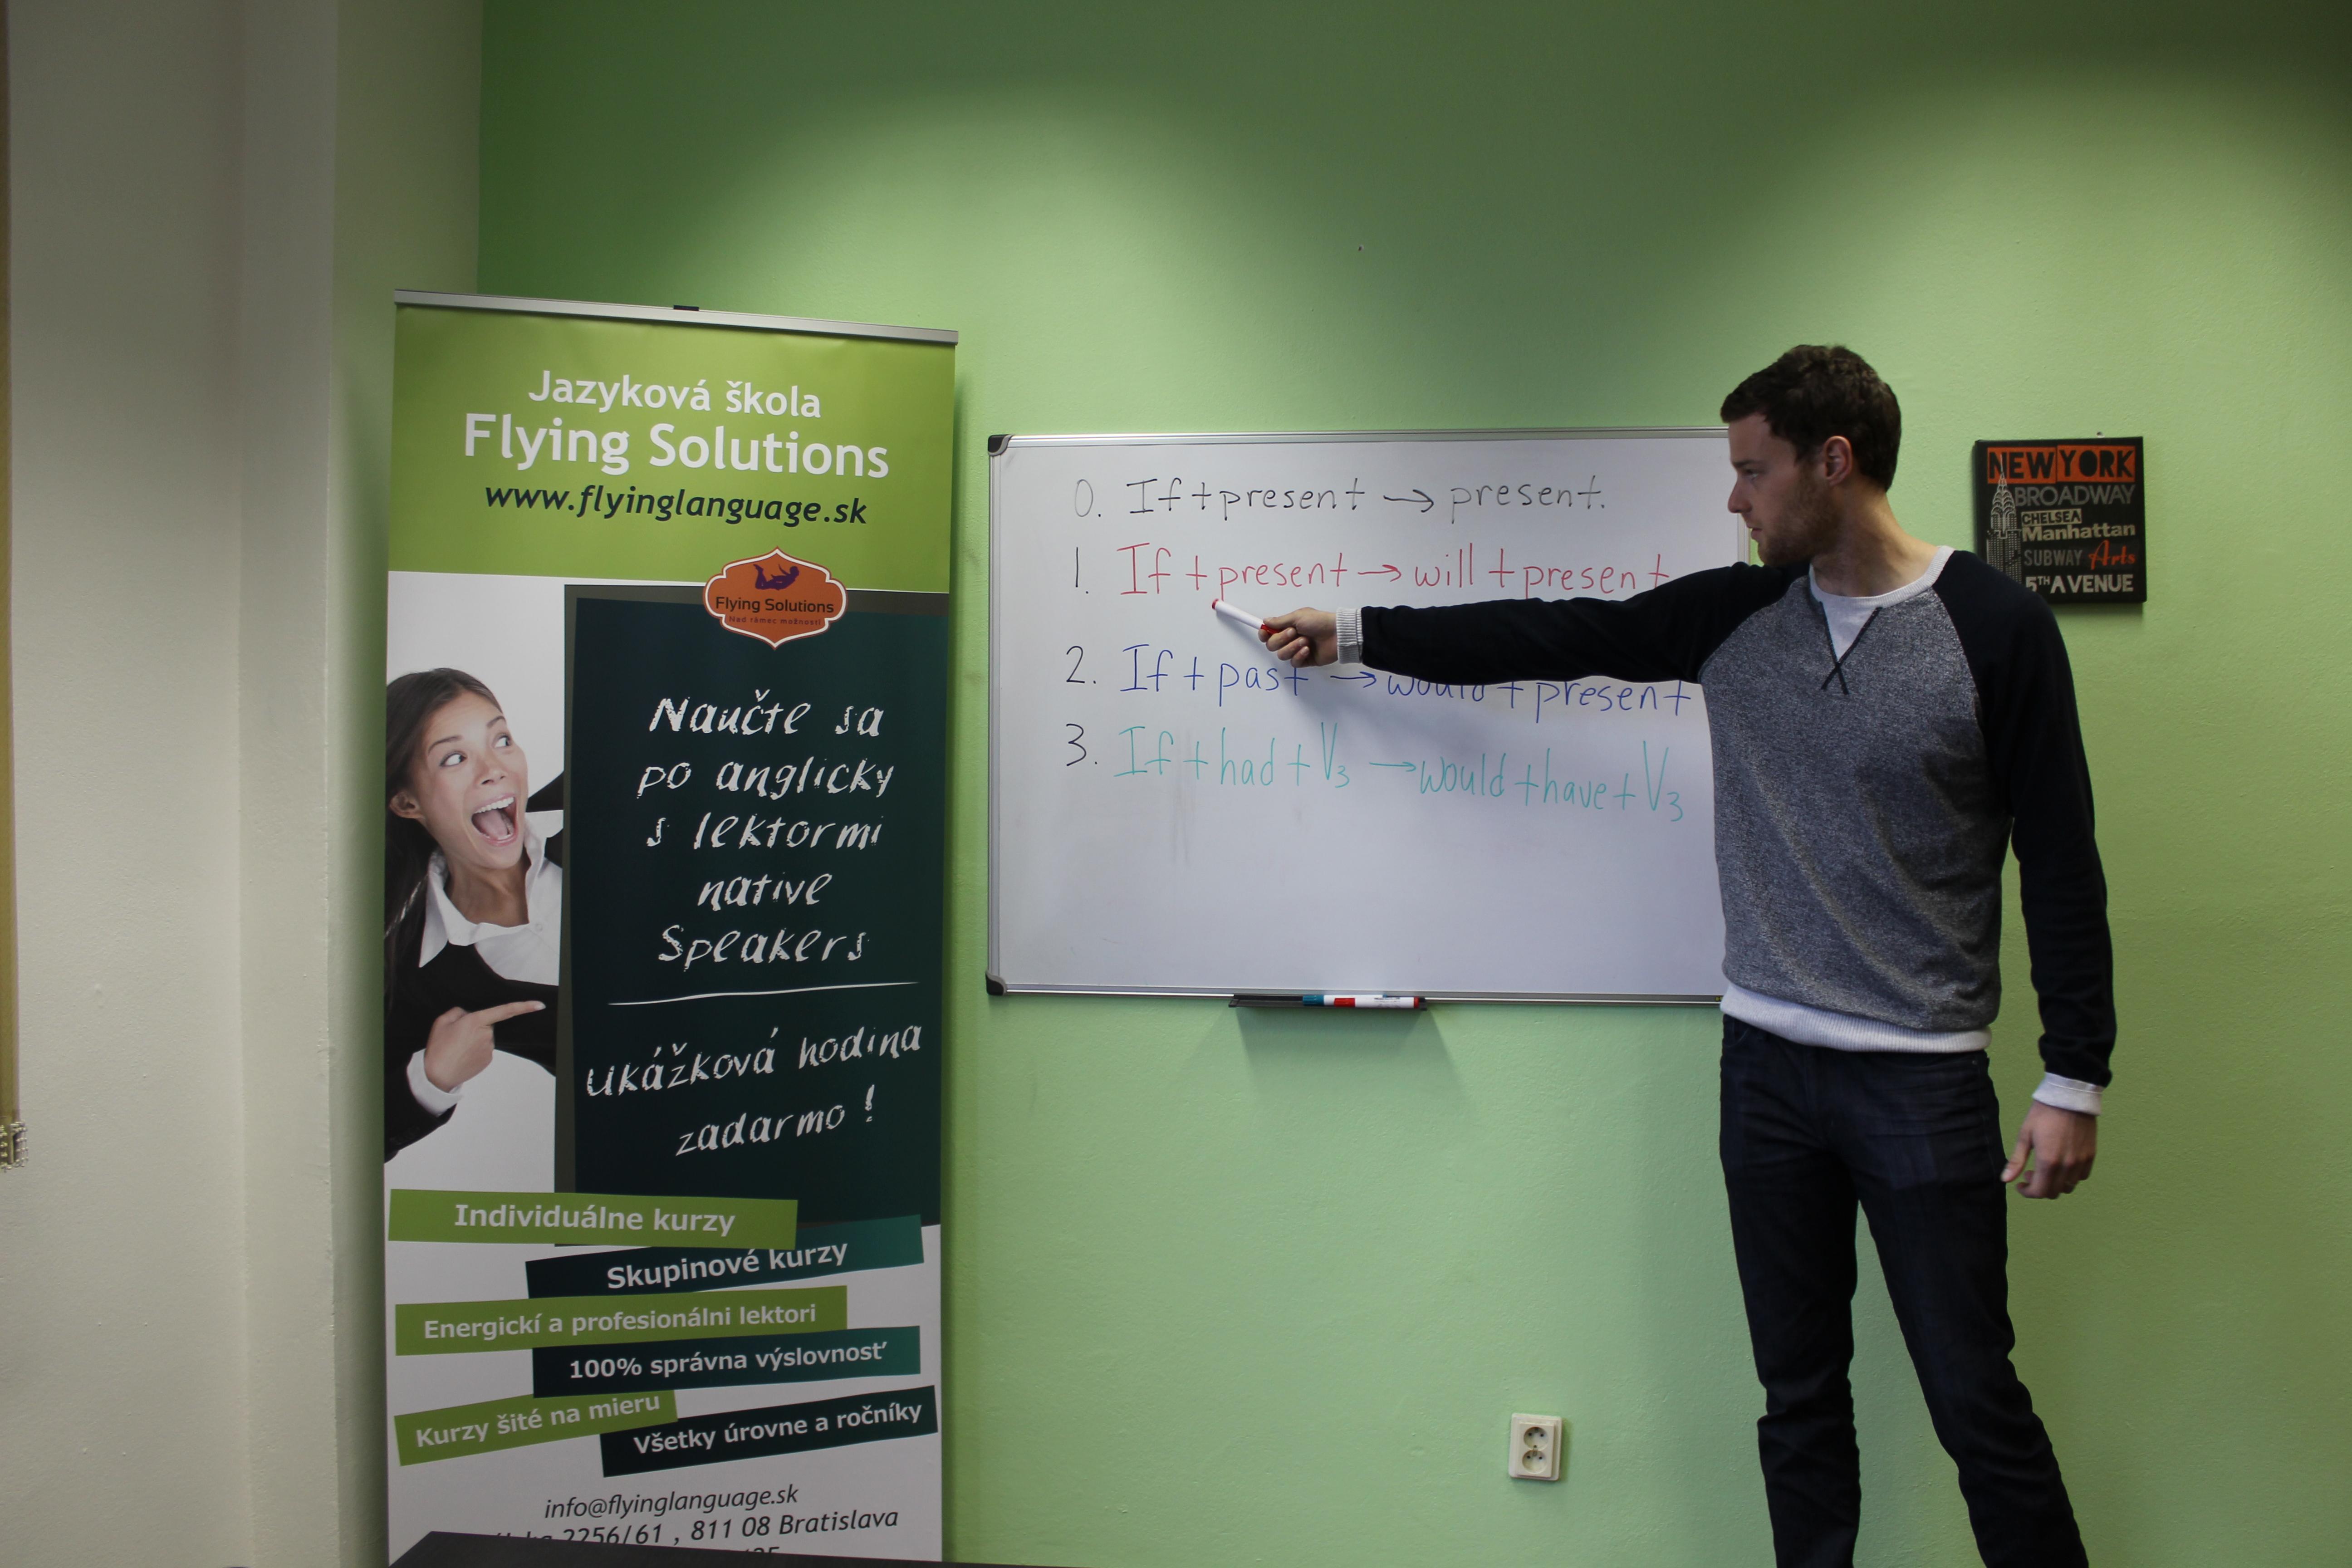 Jazyková škola Flying Solutions Bratislava lektor native speaker